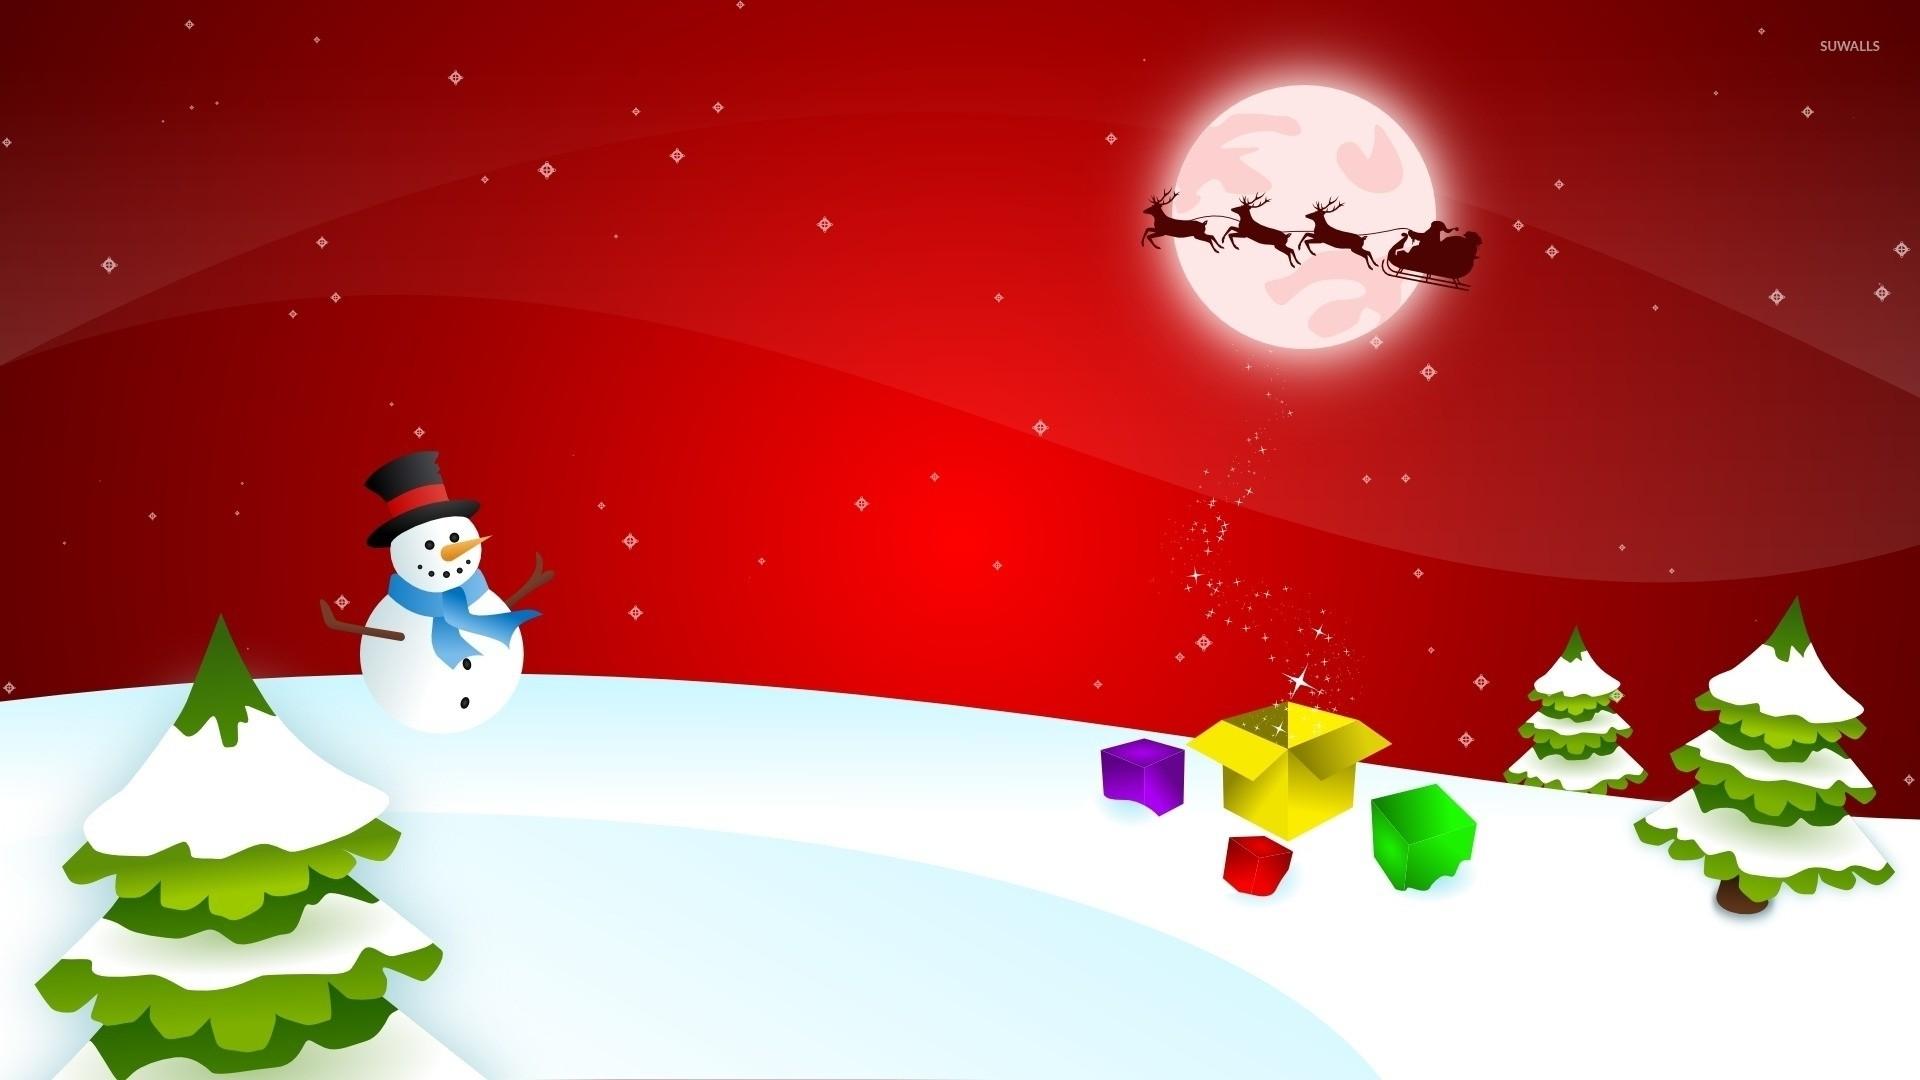 Santa Claus on the magical Christmas Eve wallpaper jpg